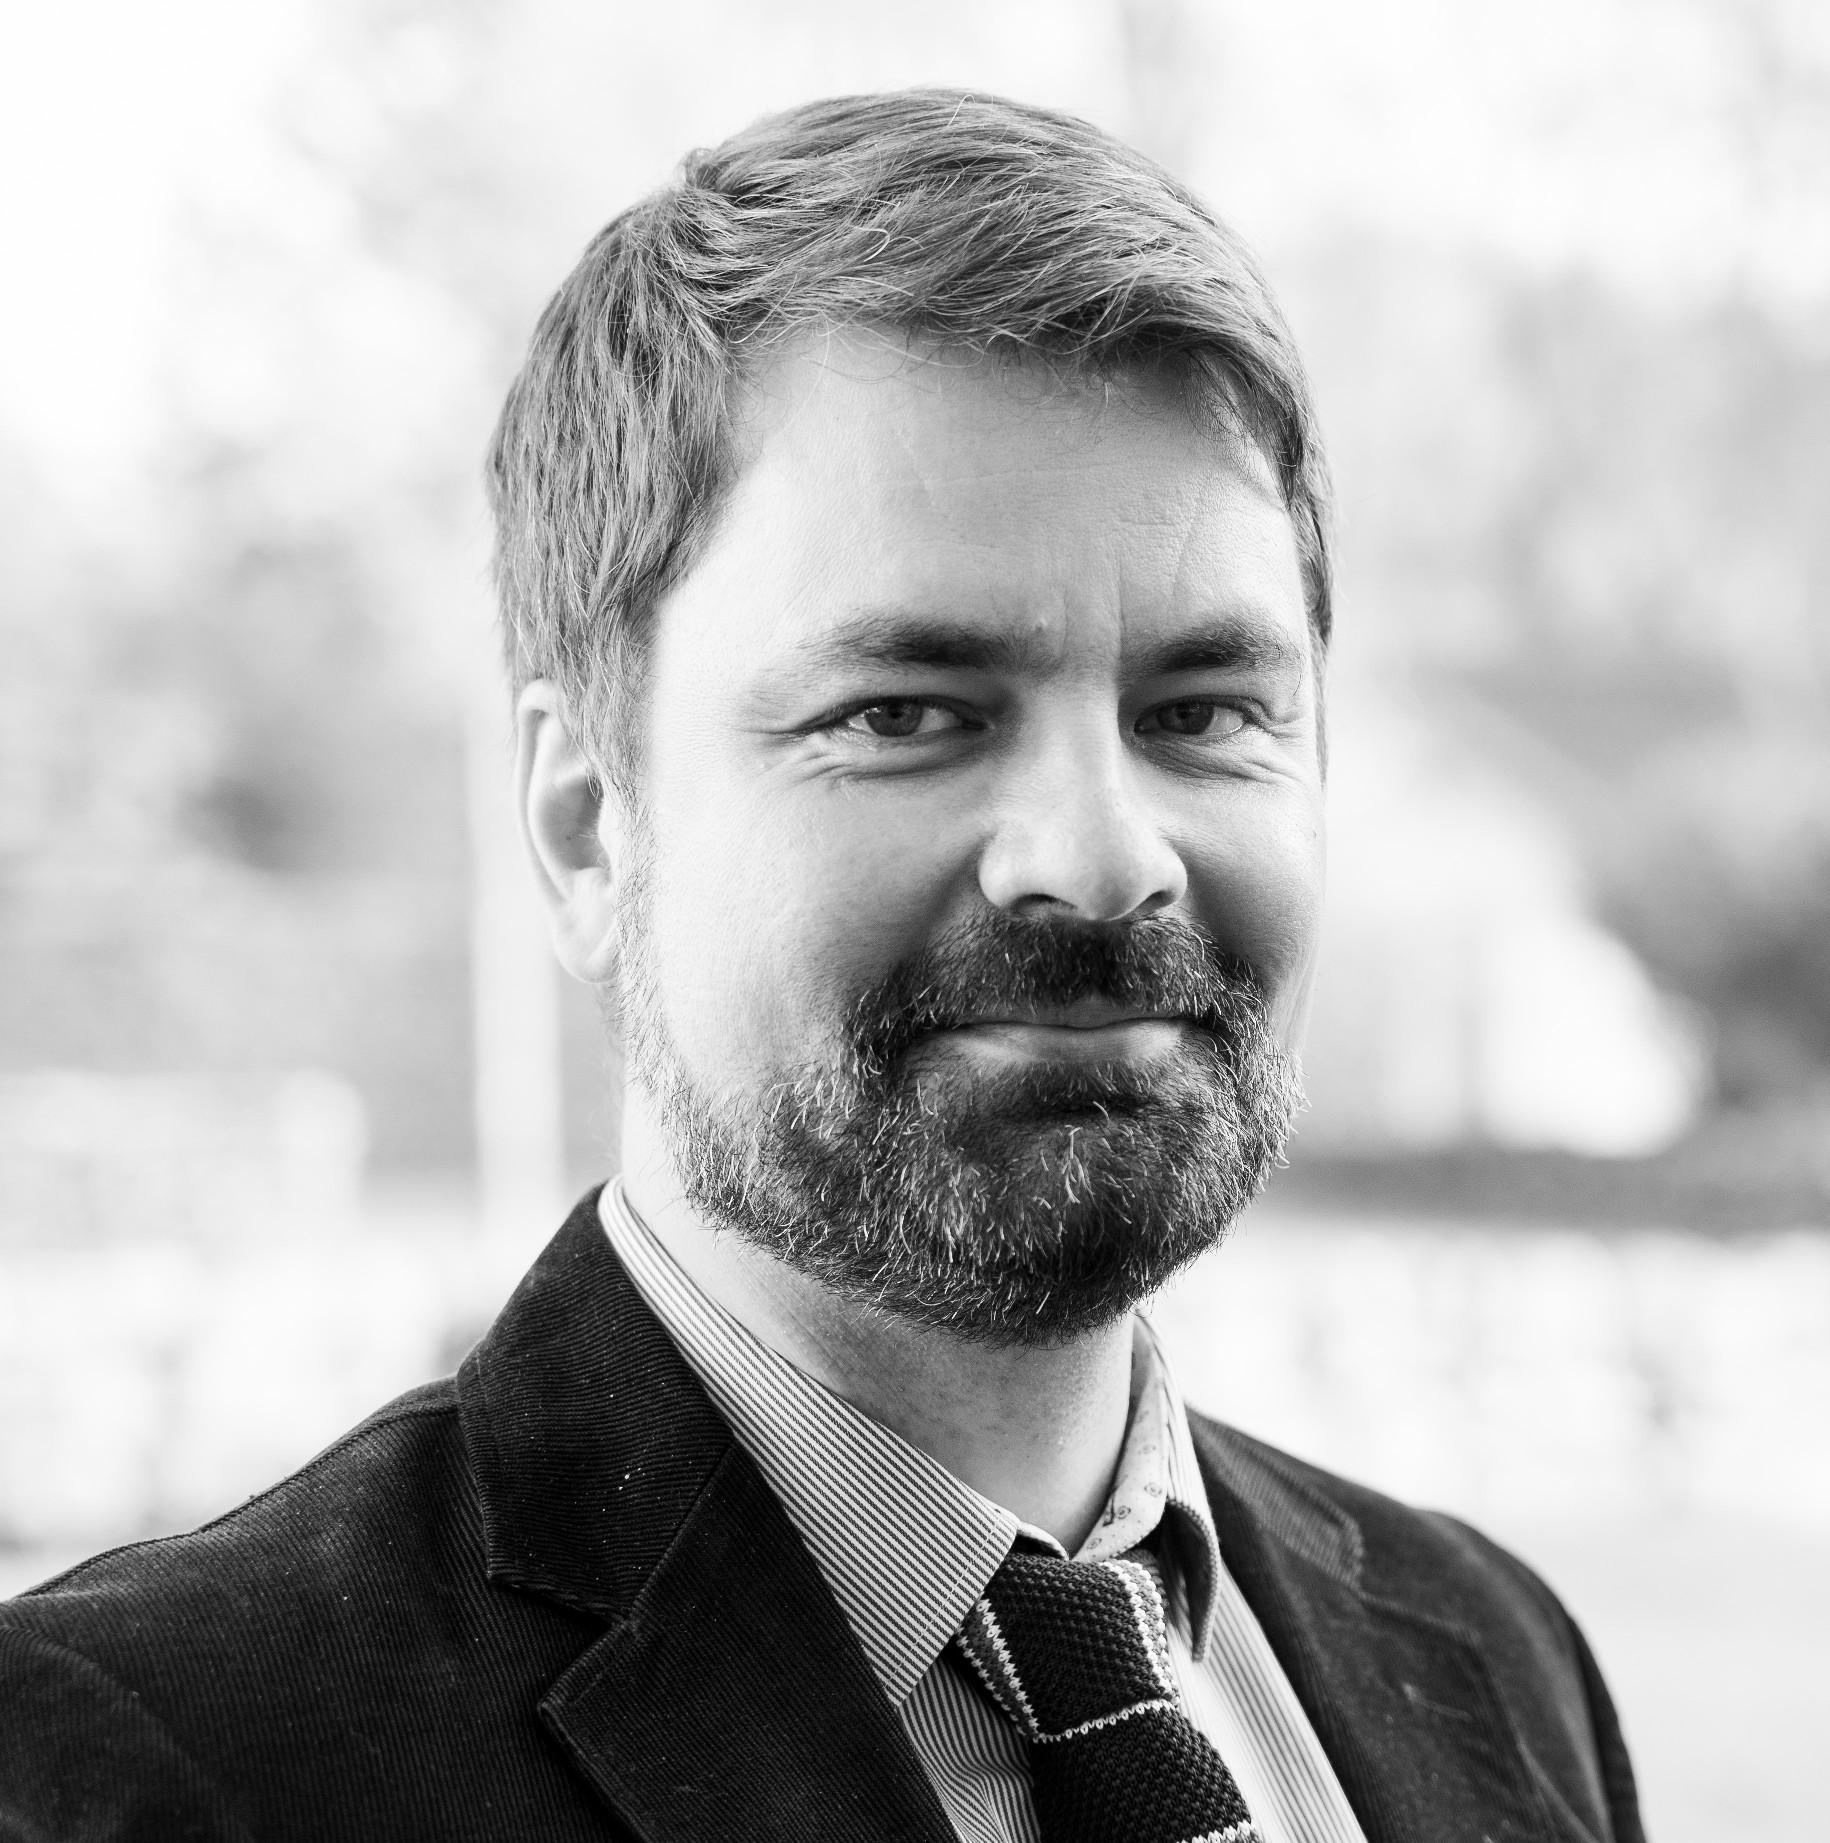 Simon Fristed Eskildsen